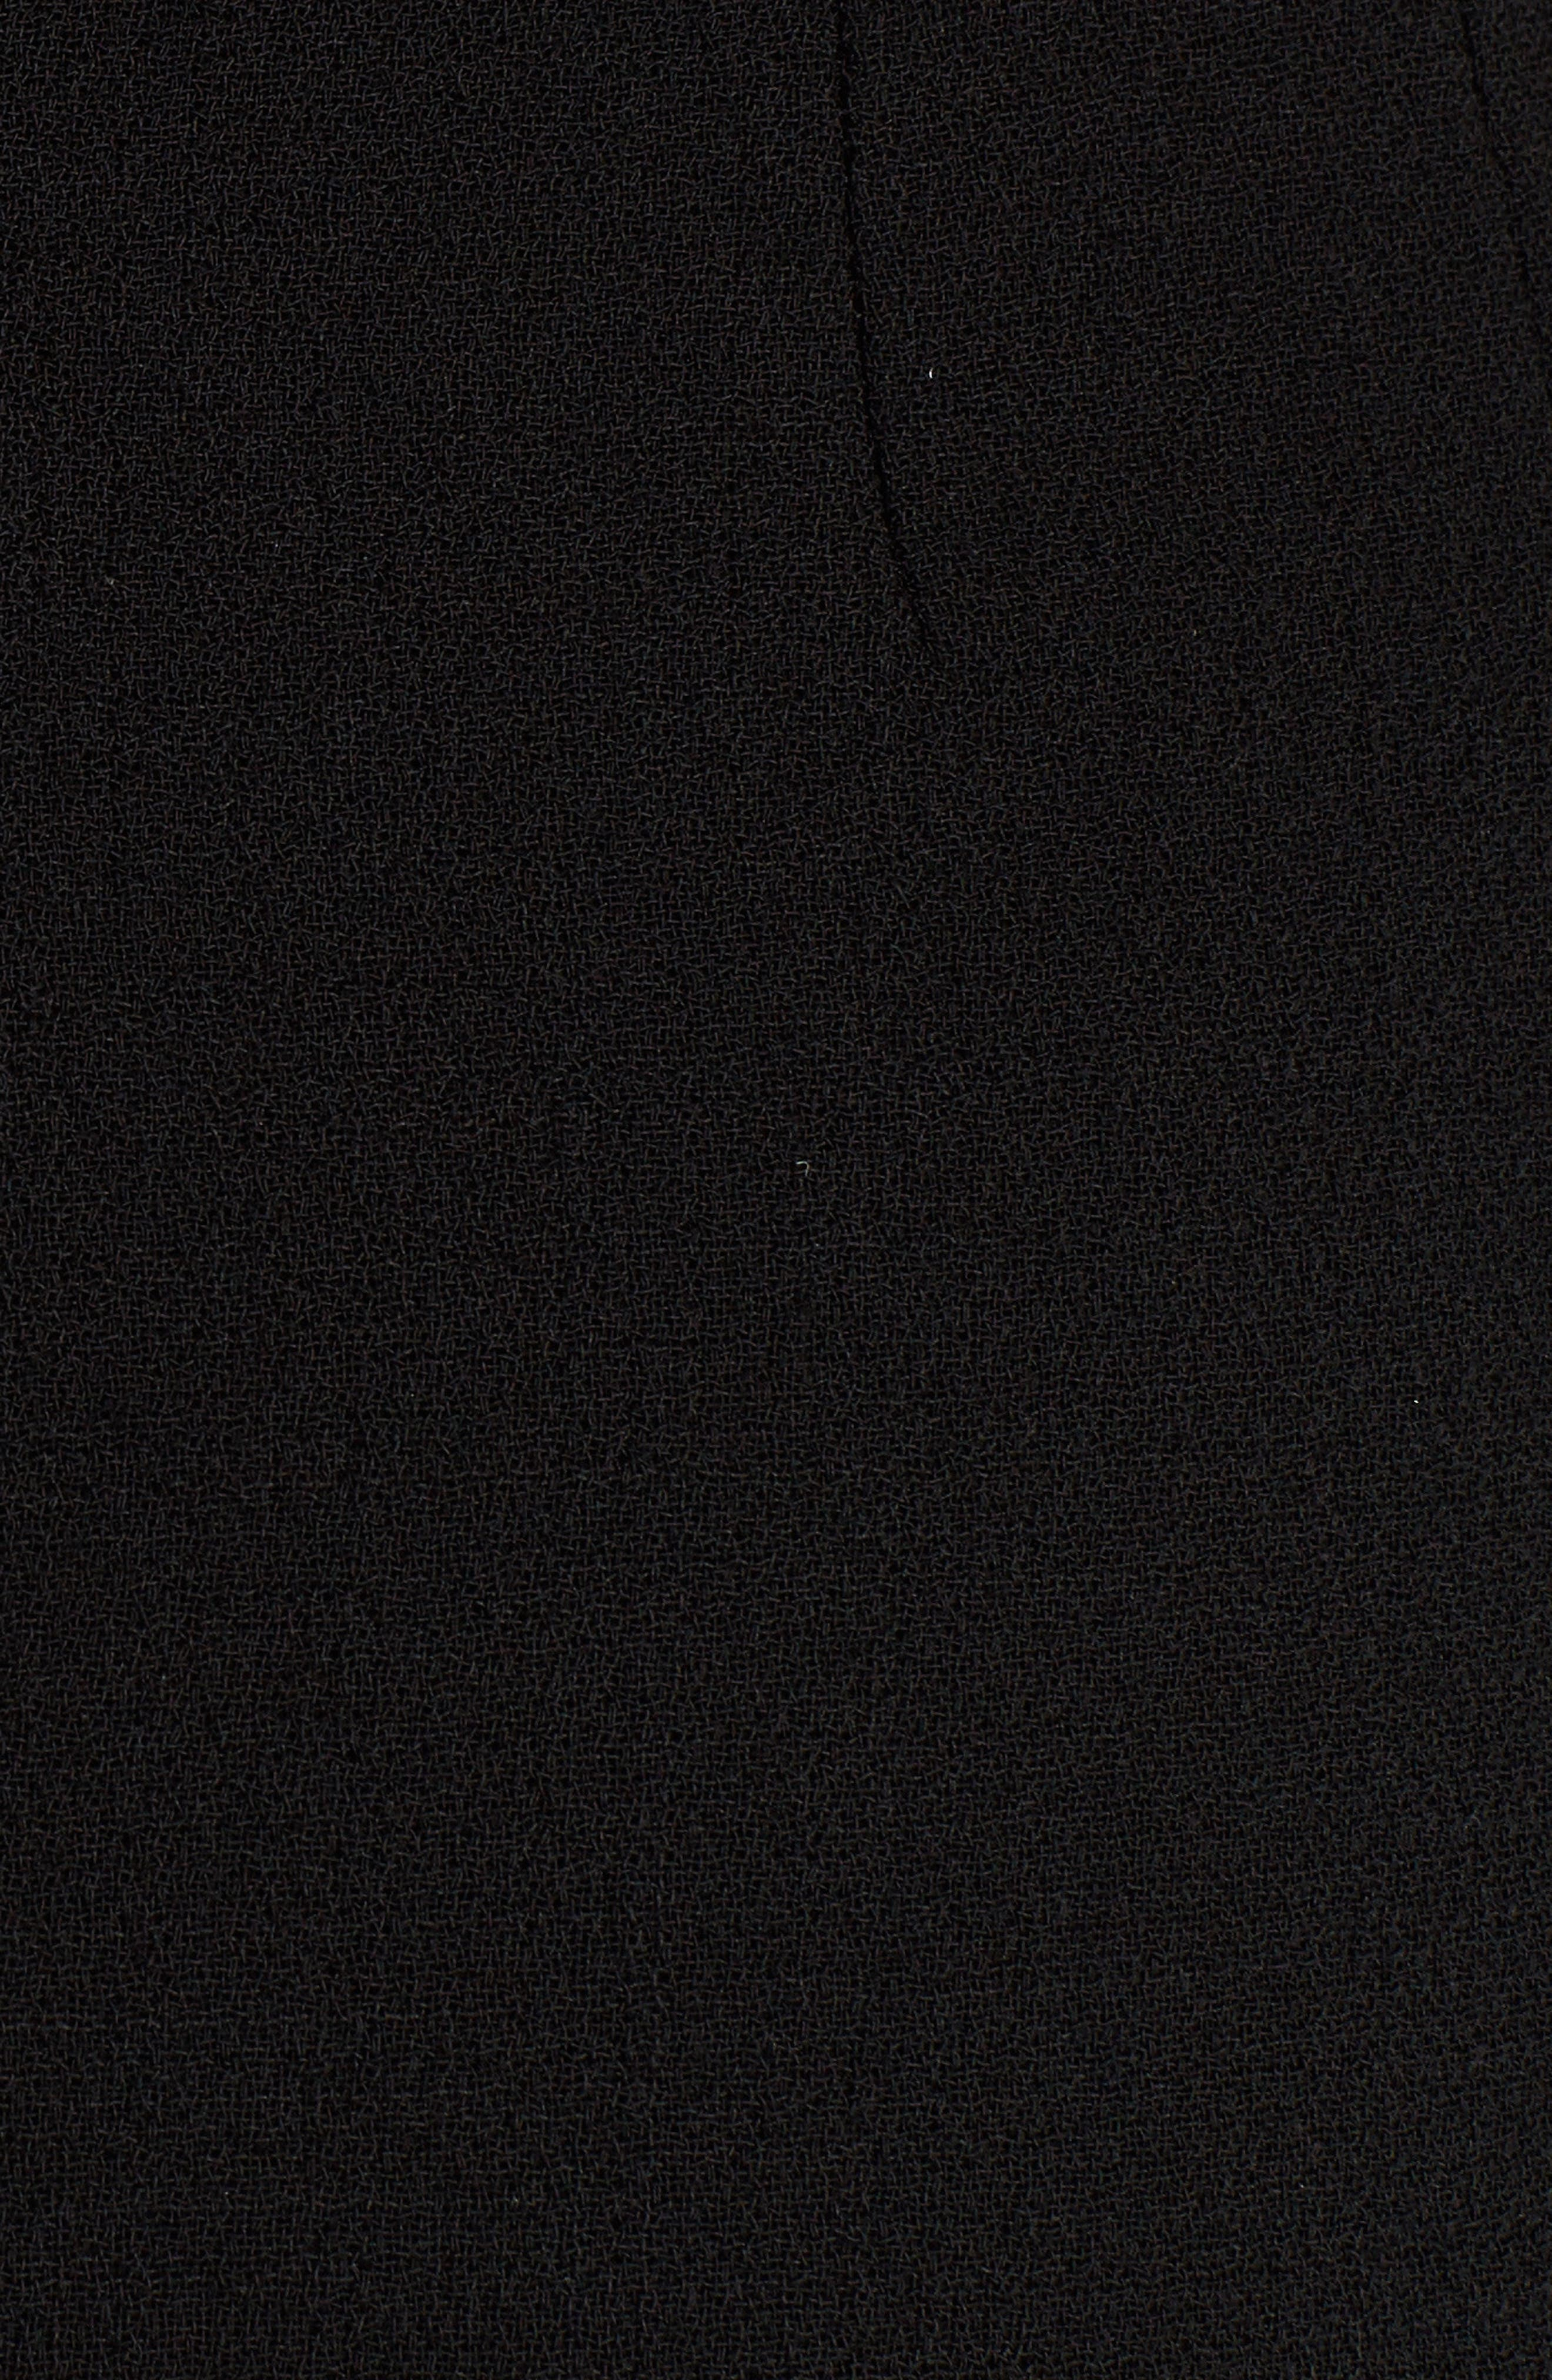 Button Detail Wool Crepe Dress,                             Alternate thumbnail 5, color,                             Black